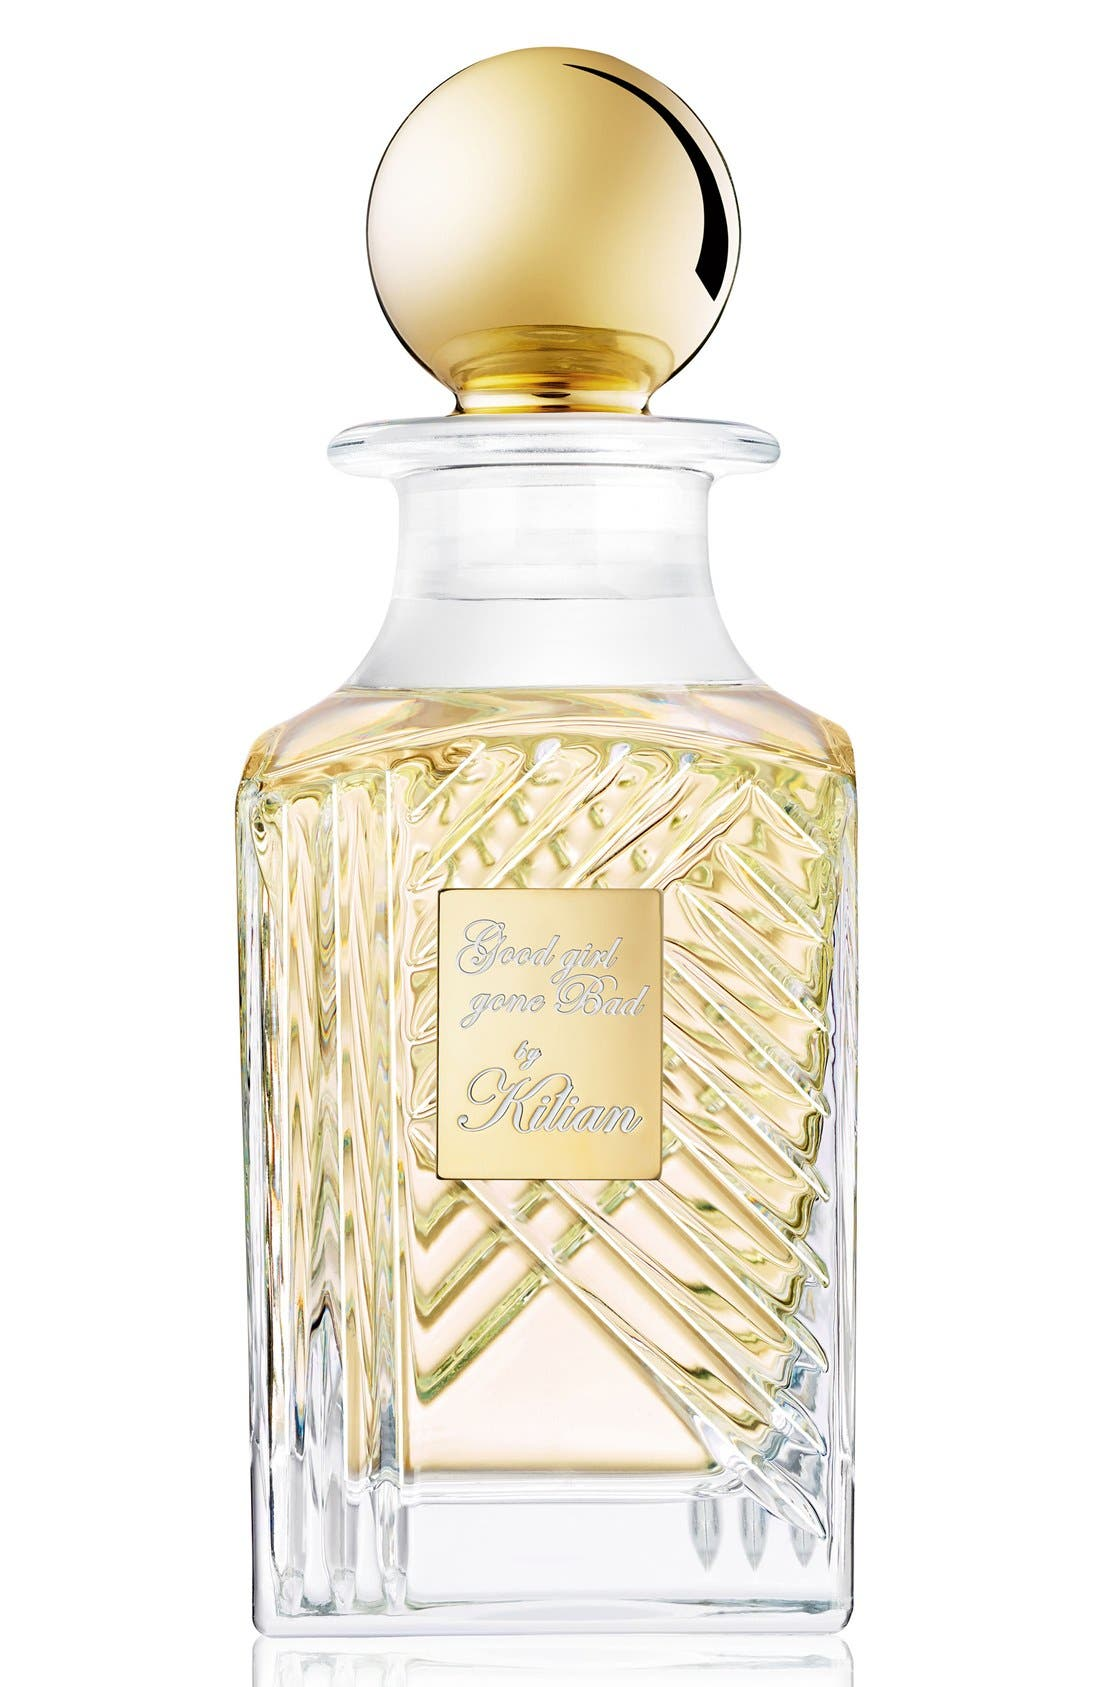 Kilian 'In the Garden of Good and Evil - Good Girl Gone Bad' Mini Fragrance Carafe